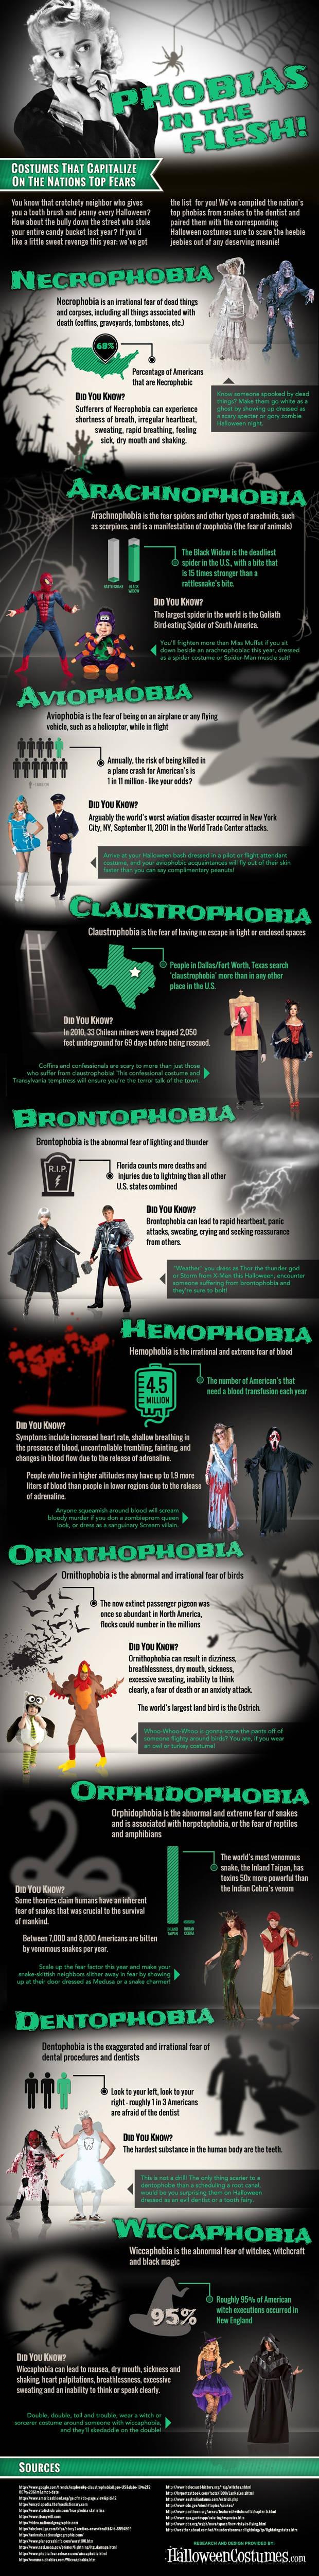 phobias-halloween-costumes